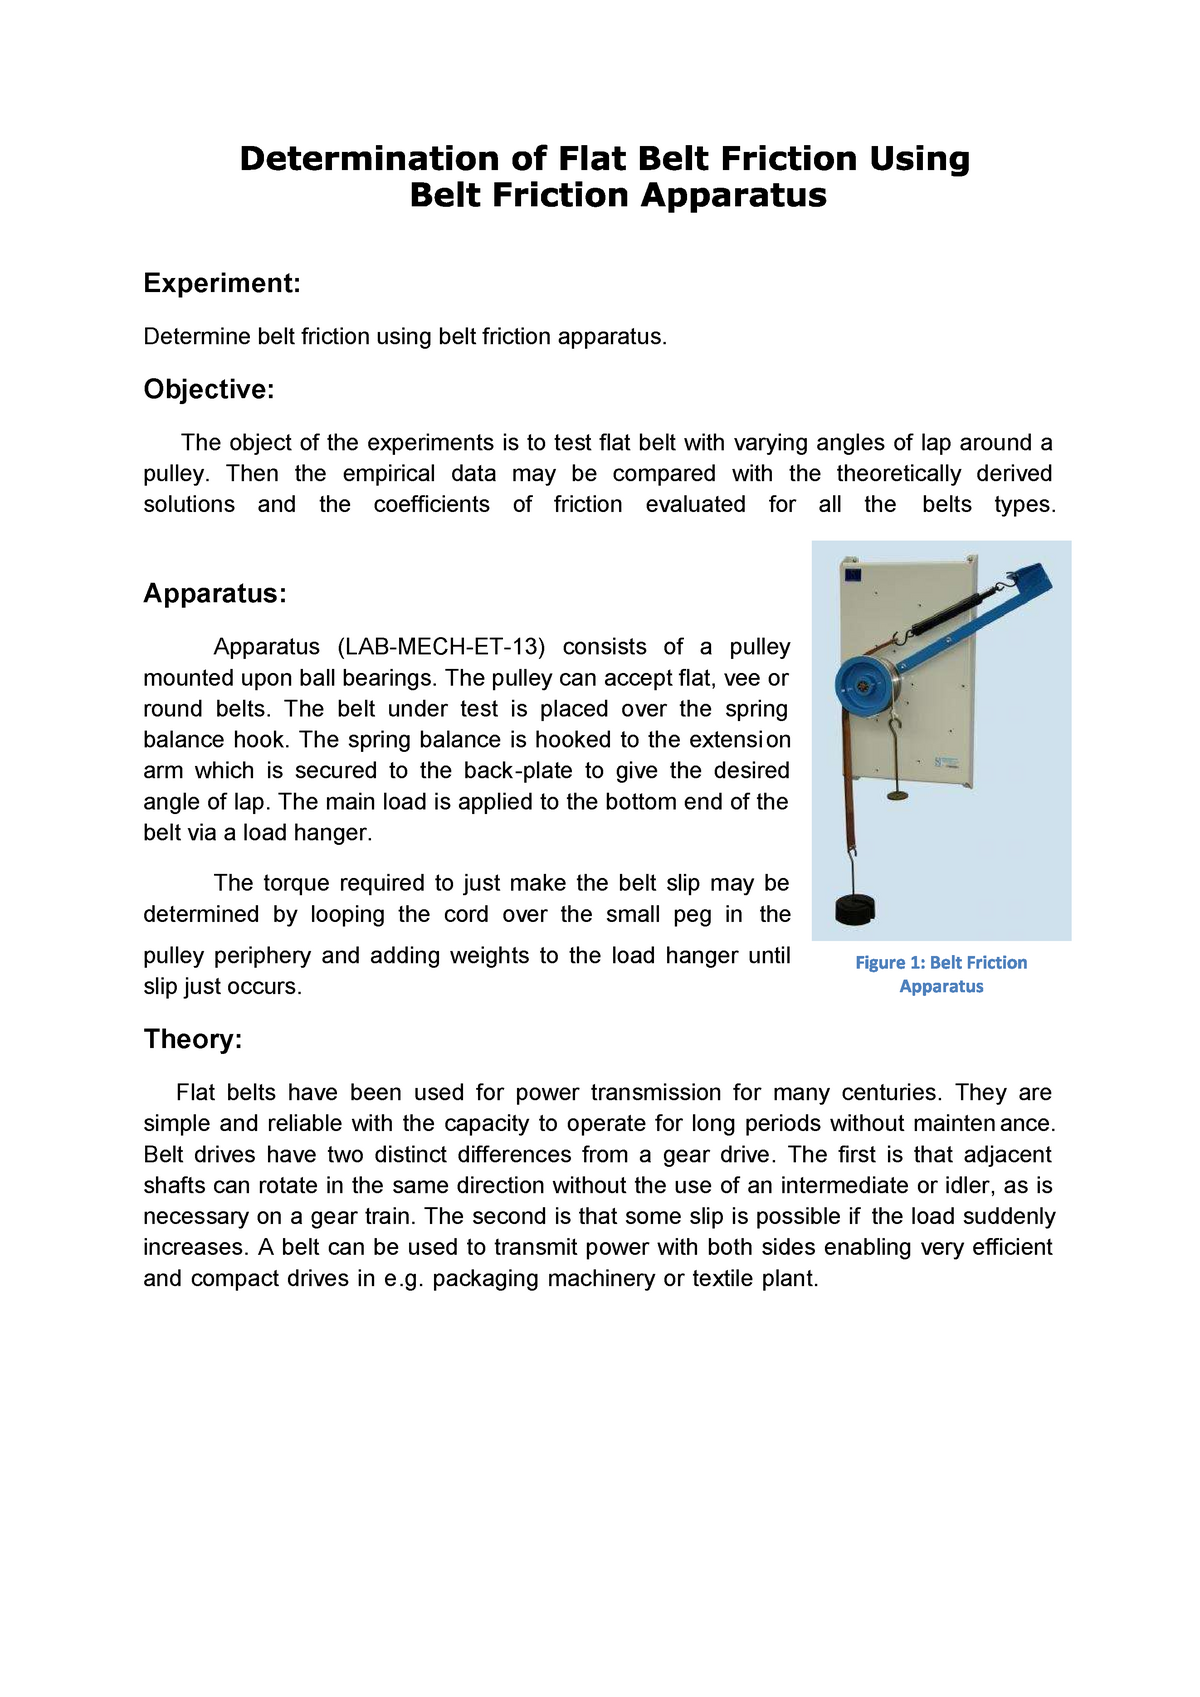 Belt Friction 2 - Dynamics ME-110 - StuDocu